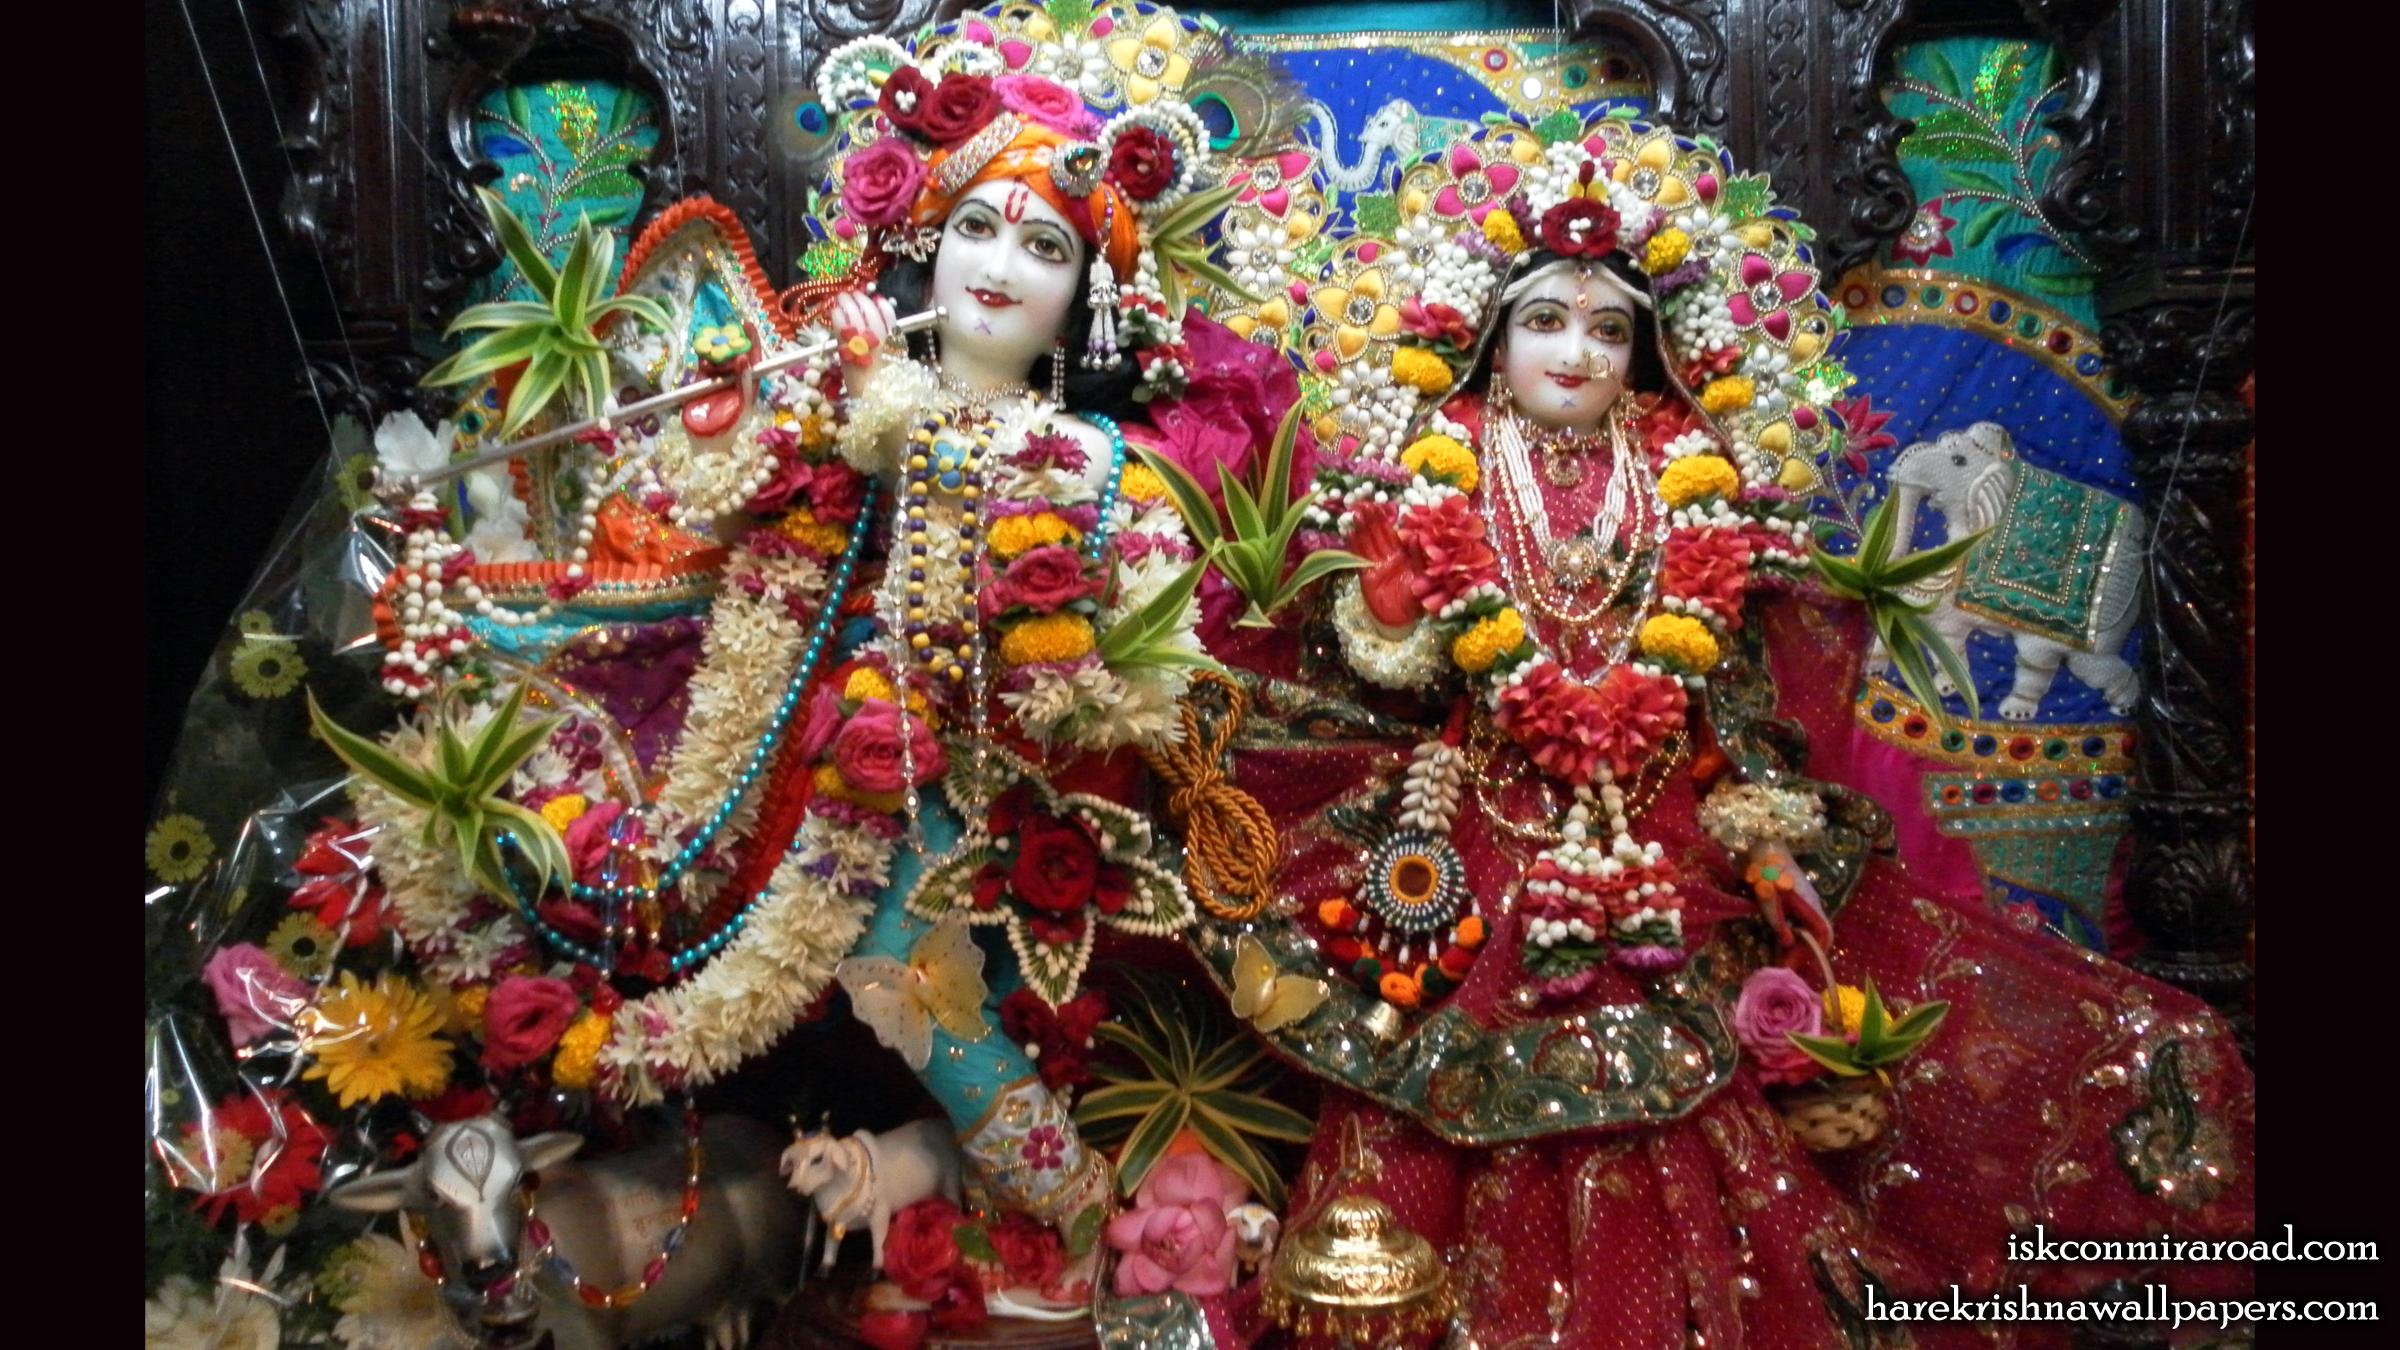 Sri Sri Radha Giridhari Wallpaper (002) Size 2400x1350 Download